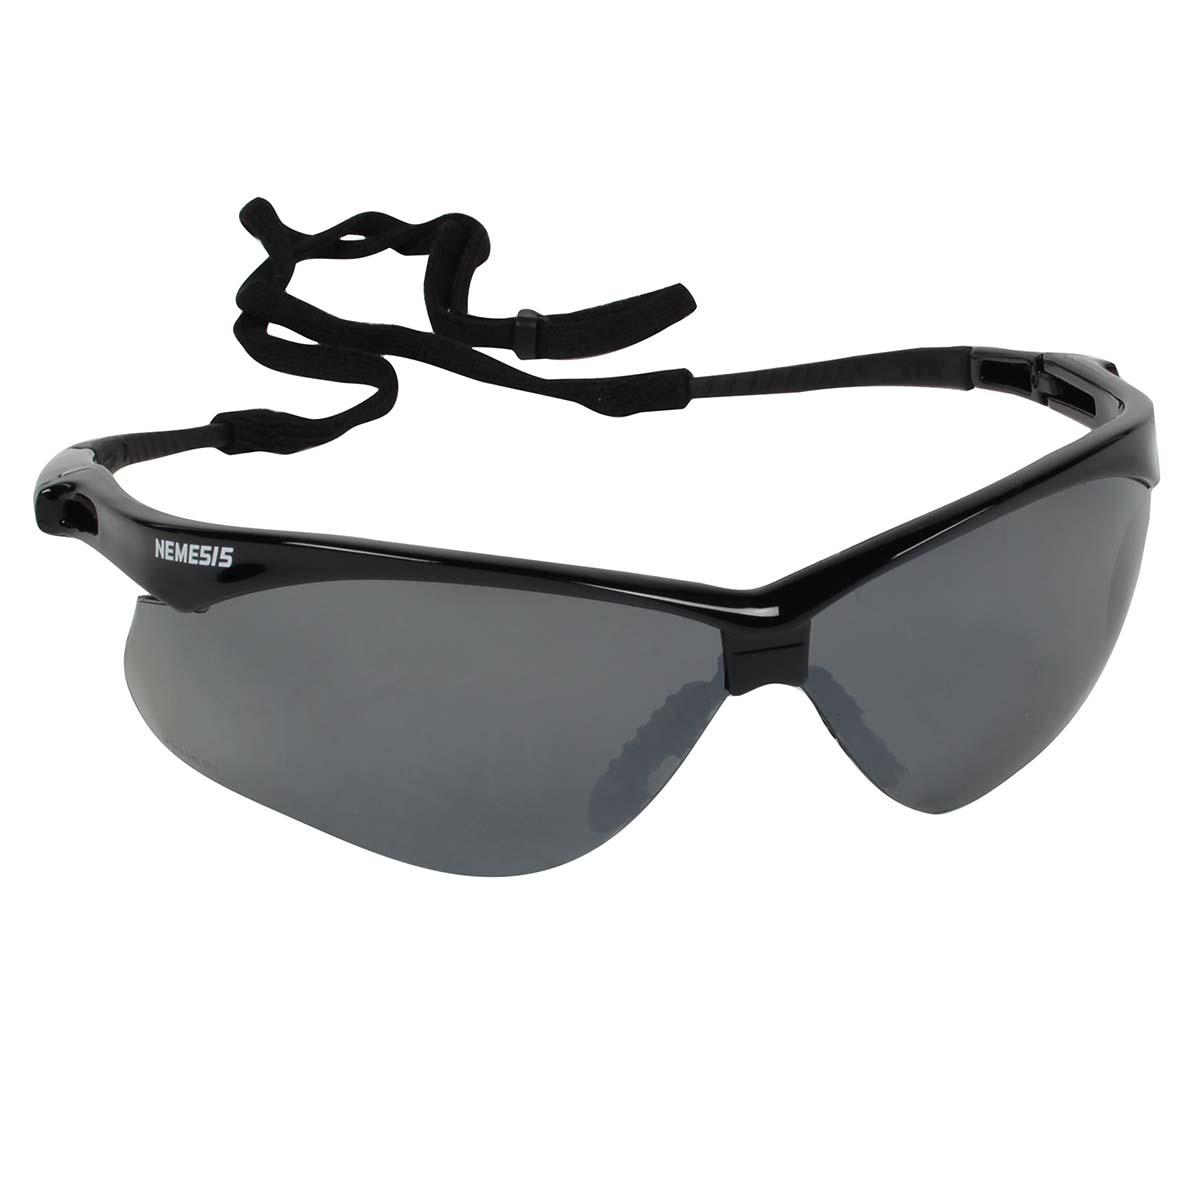 Jackson Safety Nemesis CSA Safety Glasses (20380), CSA Certified, Smoke Mirror Lens with Black Frame, 12 Pairs / Case